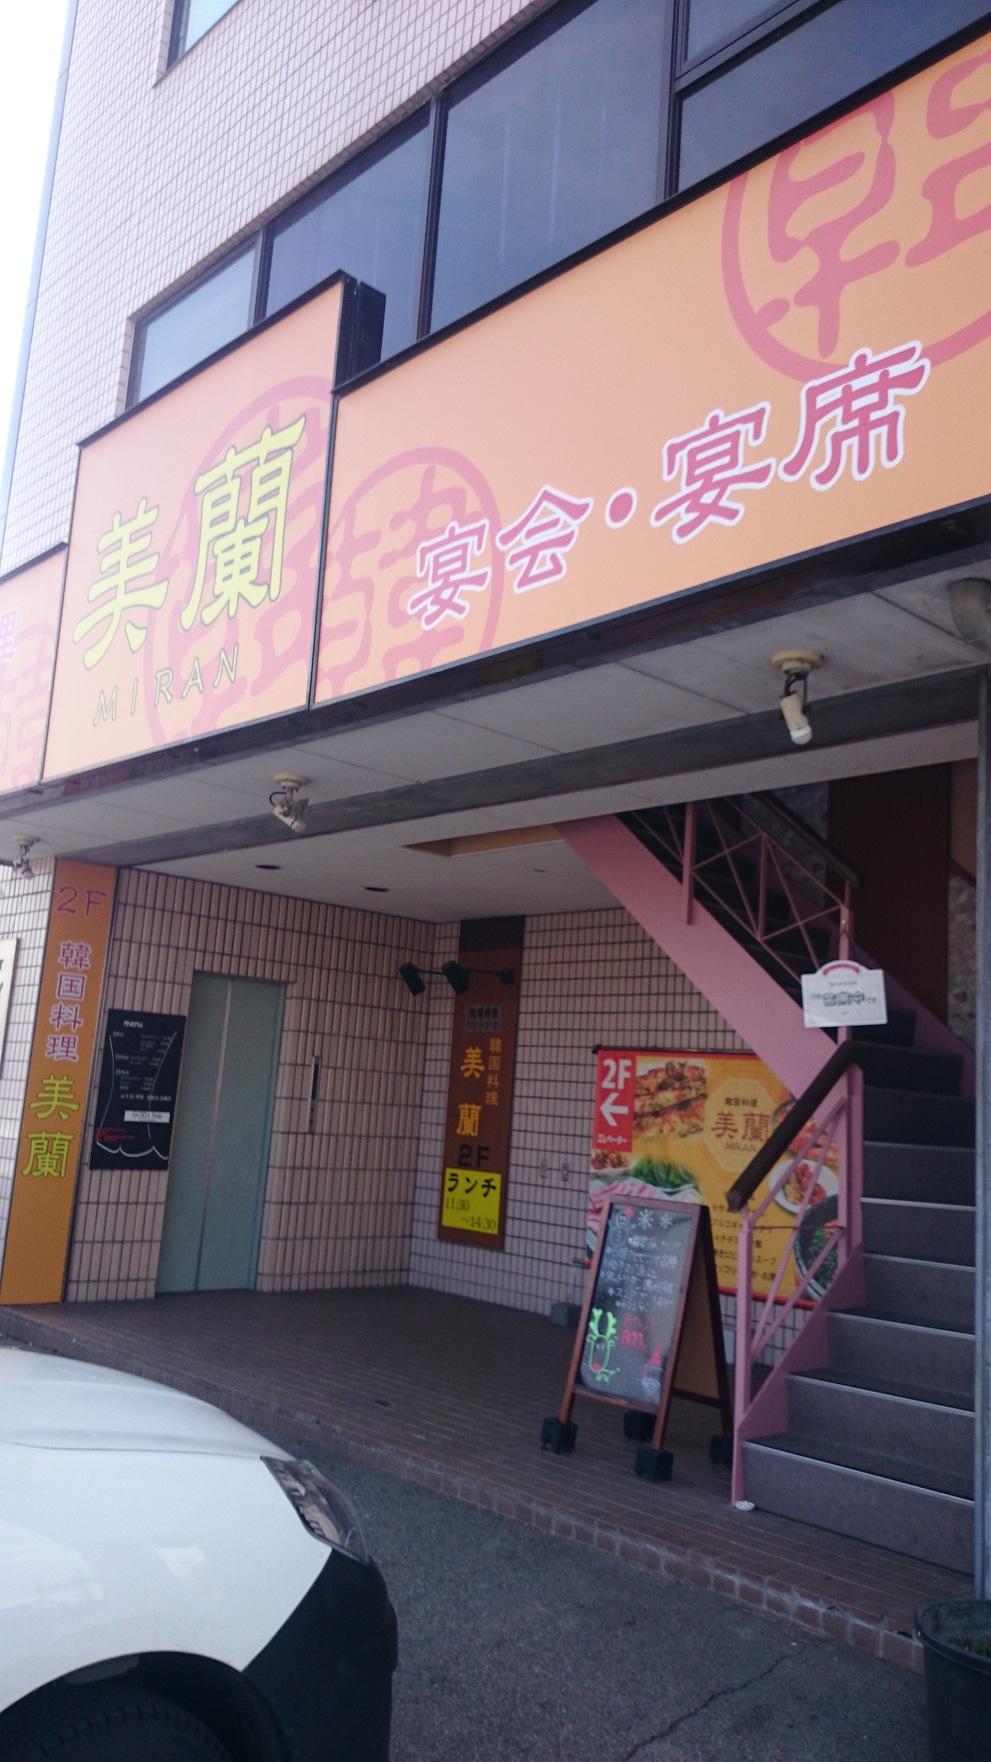 韓国料理美蘭 松本インター店